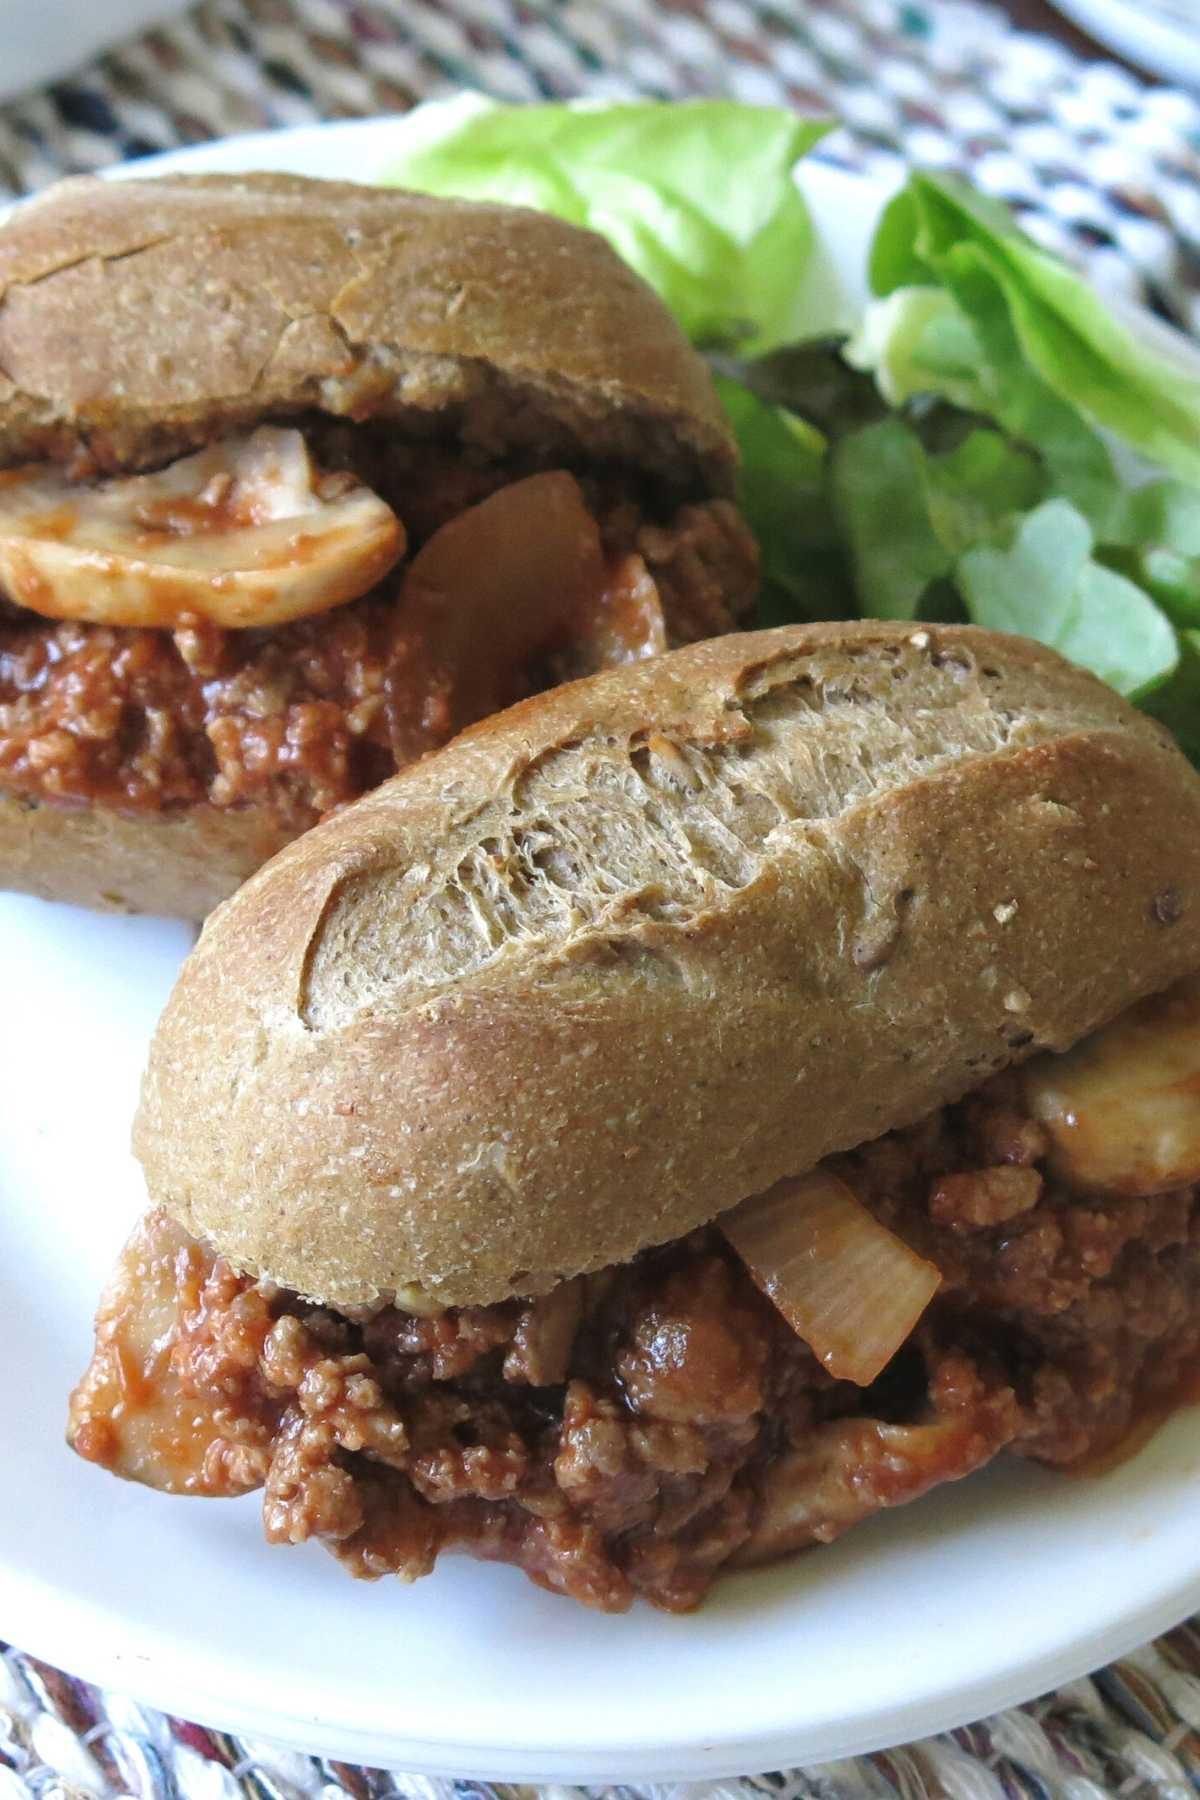 Gourmet sloppy joes in baguetts on a plate.